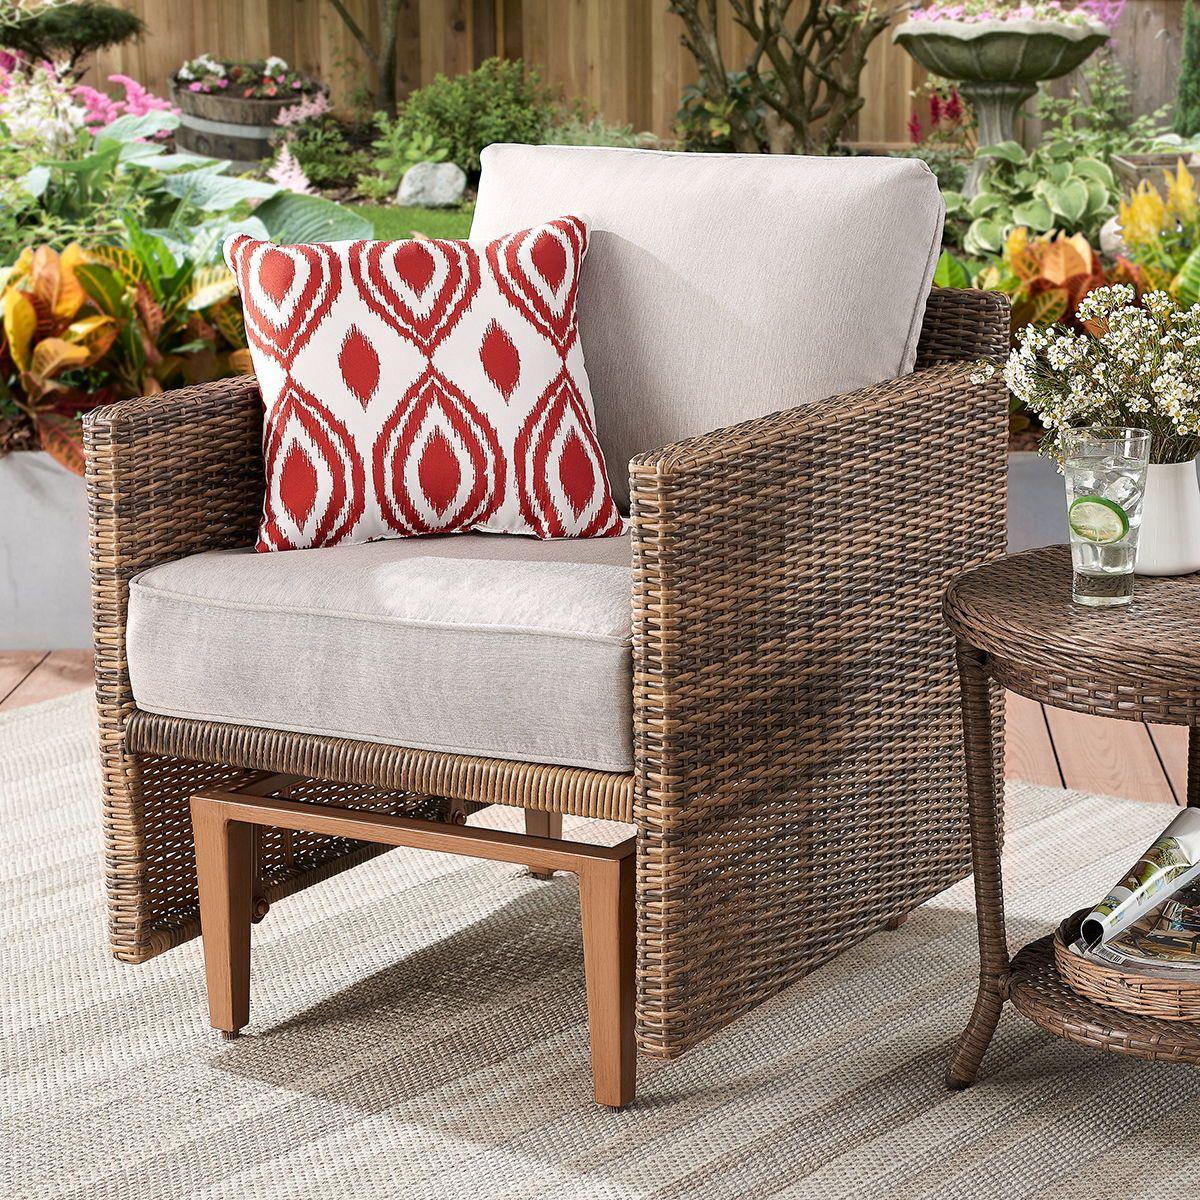 Davenport Patio Furniture.Patio Garden Outdoor Living Glider Chair Beige Cushions